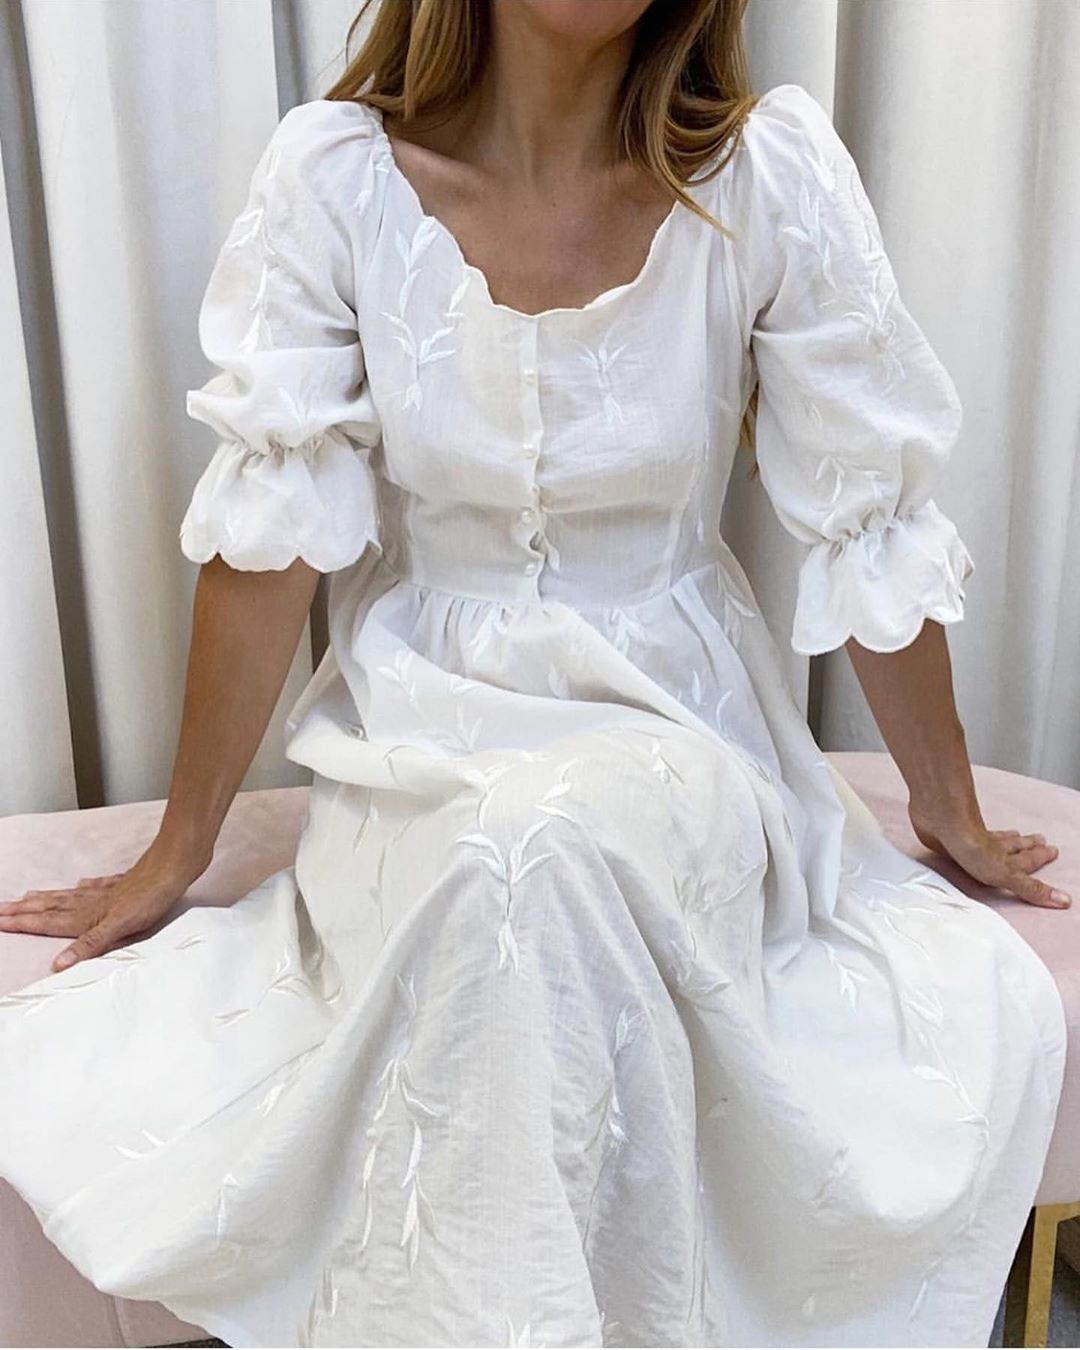 V I T A G R A C E On Instagram Summer Day Dresses Just Add Pretty Flats Sunshine Vitagrace Summer Day Dresses White Dress Cottagecore Fashion [ 1350 x 1080 Pixel ]